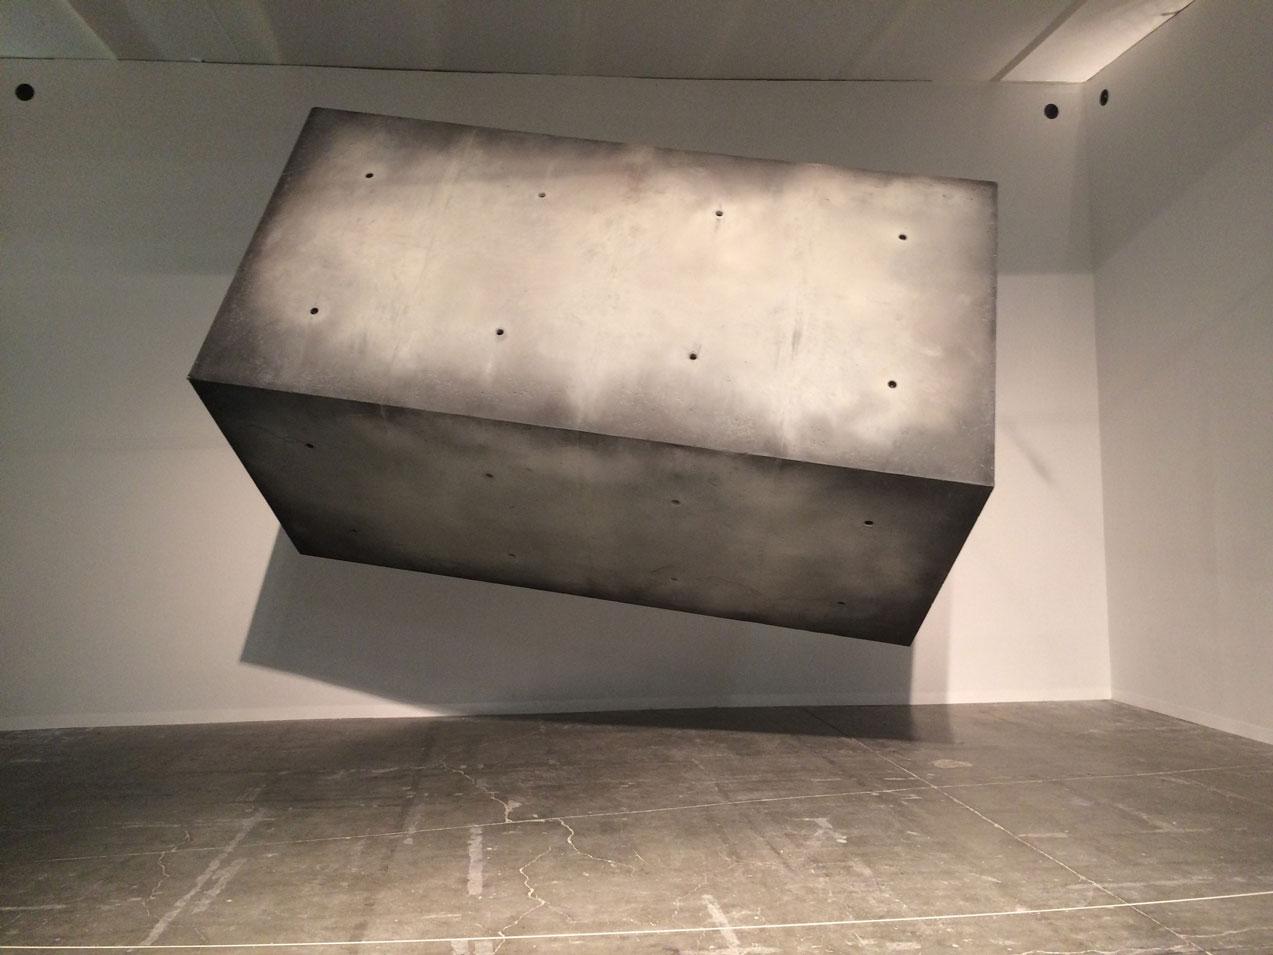 Studio Drift,  Drifter,  2017, Pace Gallery, New York, NY